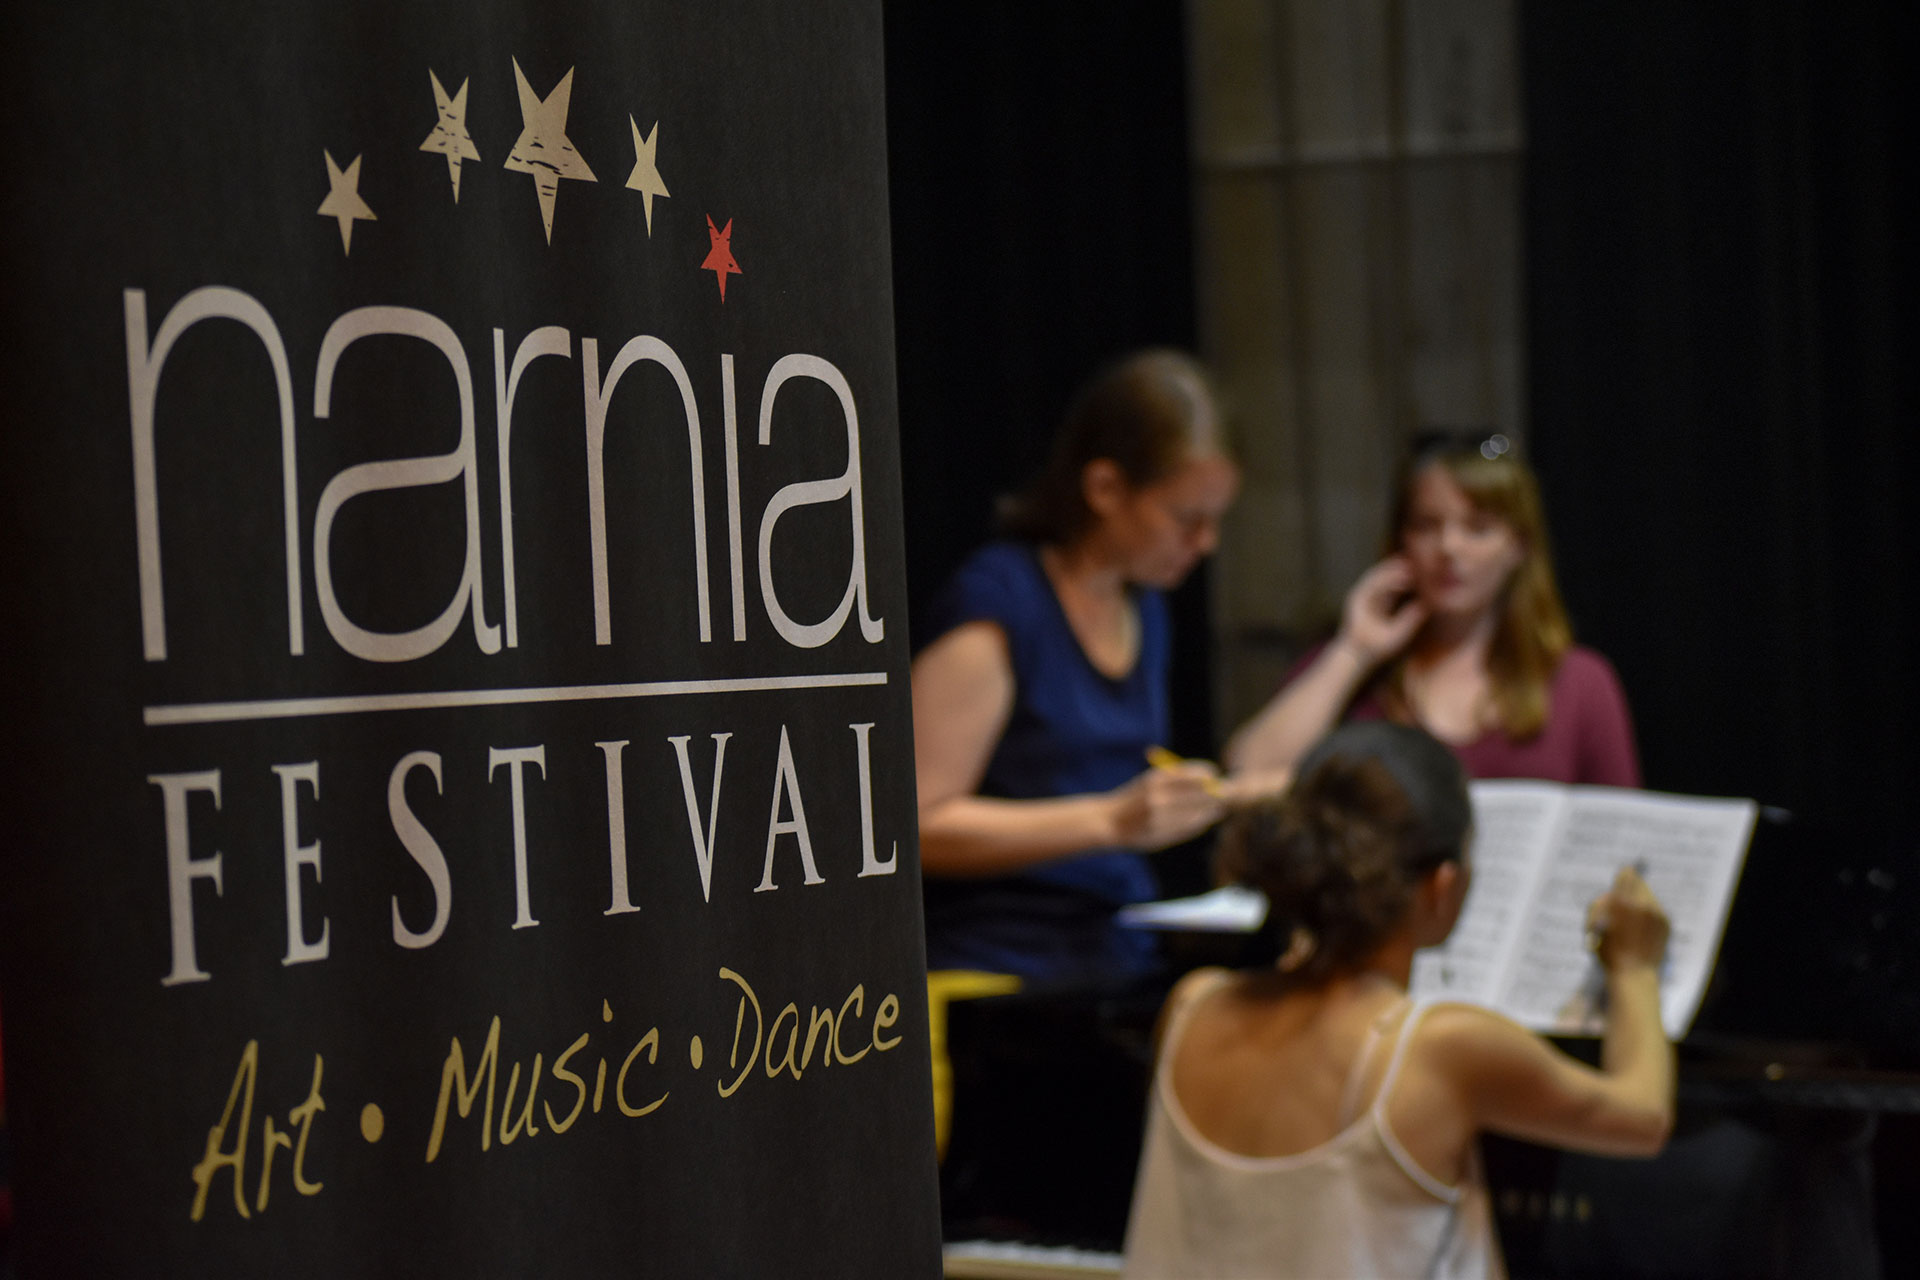 International Vocal Arts Program – Narnia Festival